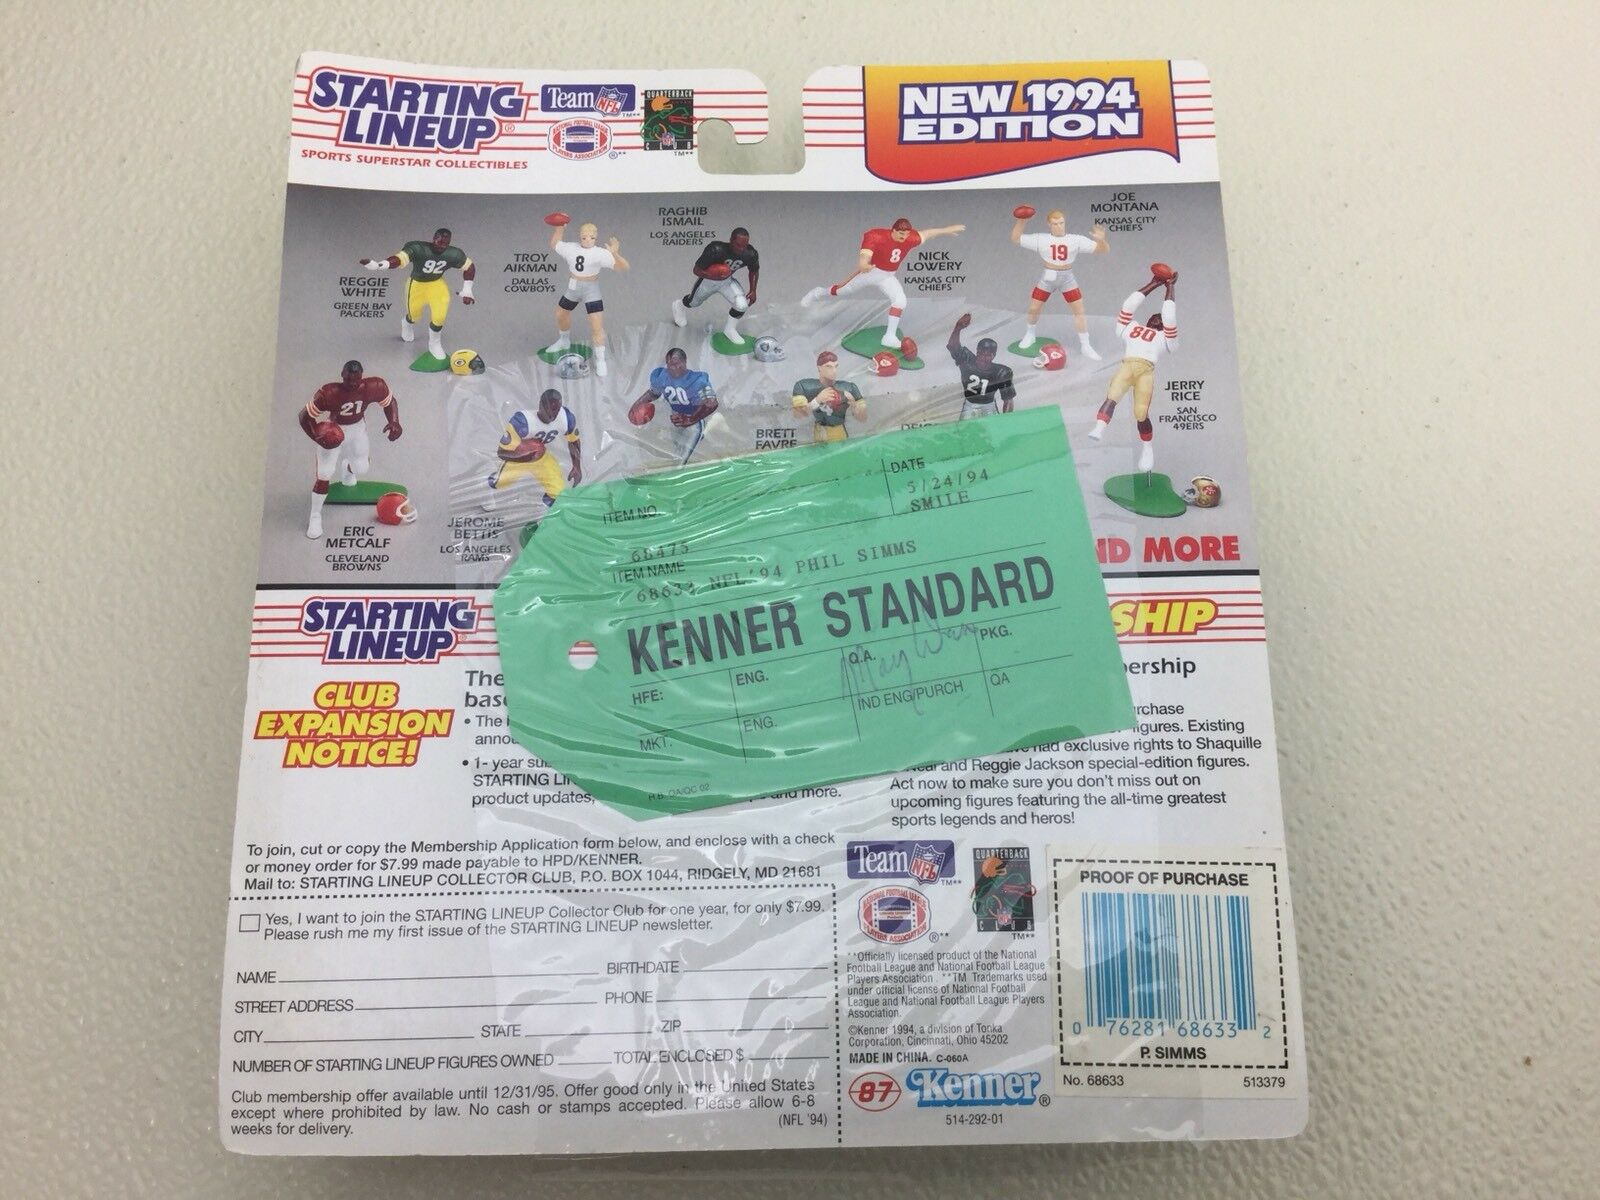 KENNER STeARD 1994 PHIL  SIMMS estrellaTING LINEUP  nuovo YORK N.Y. NY GIANTS SLU  Ultimo 2018